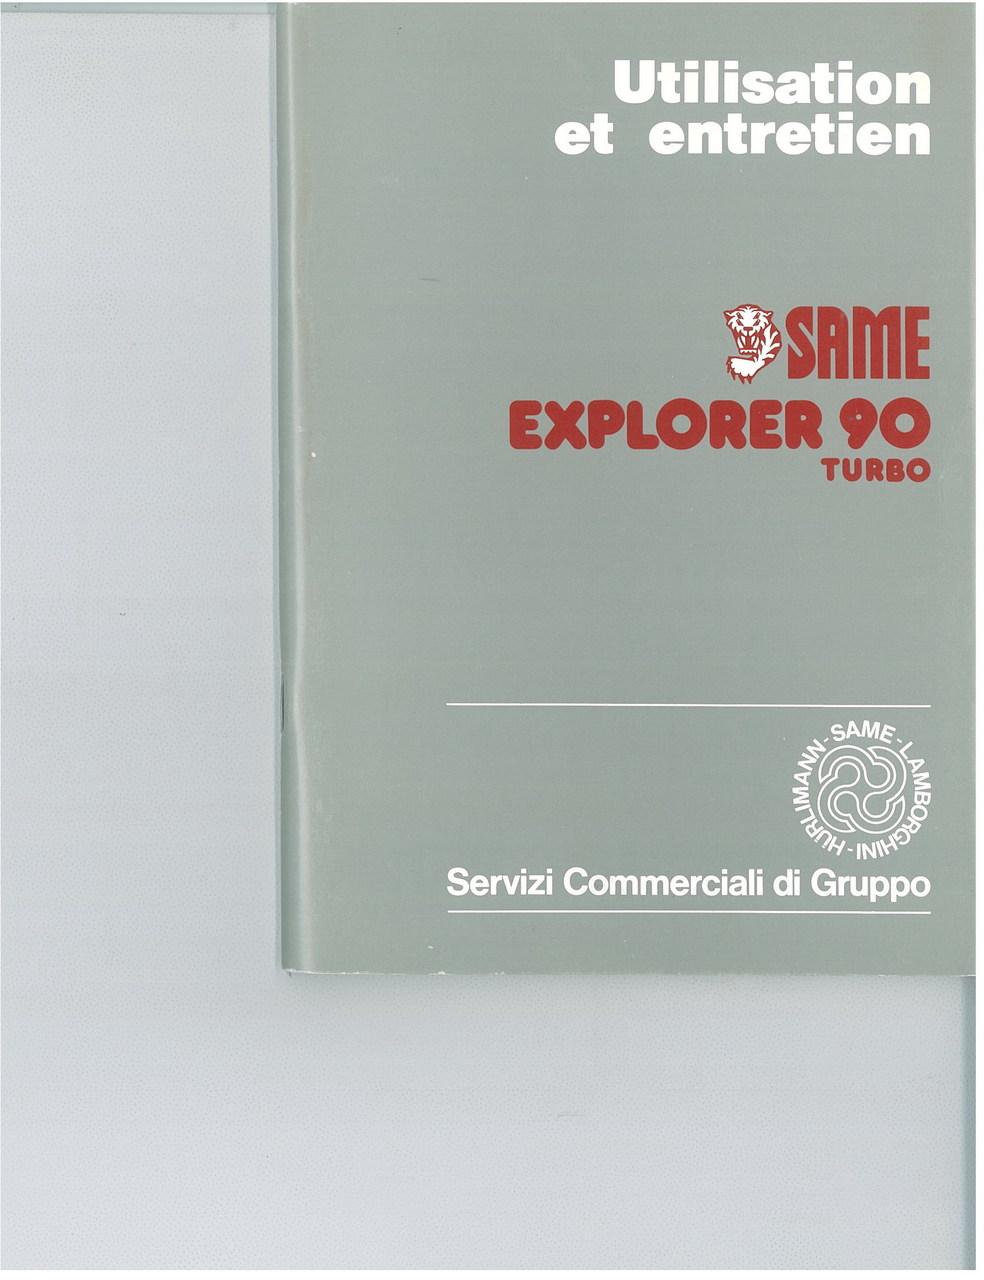 EXPLORER 90 TURBO - Utilisation et entretien